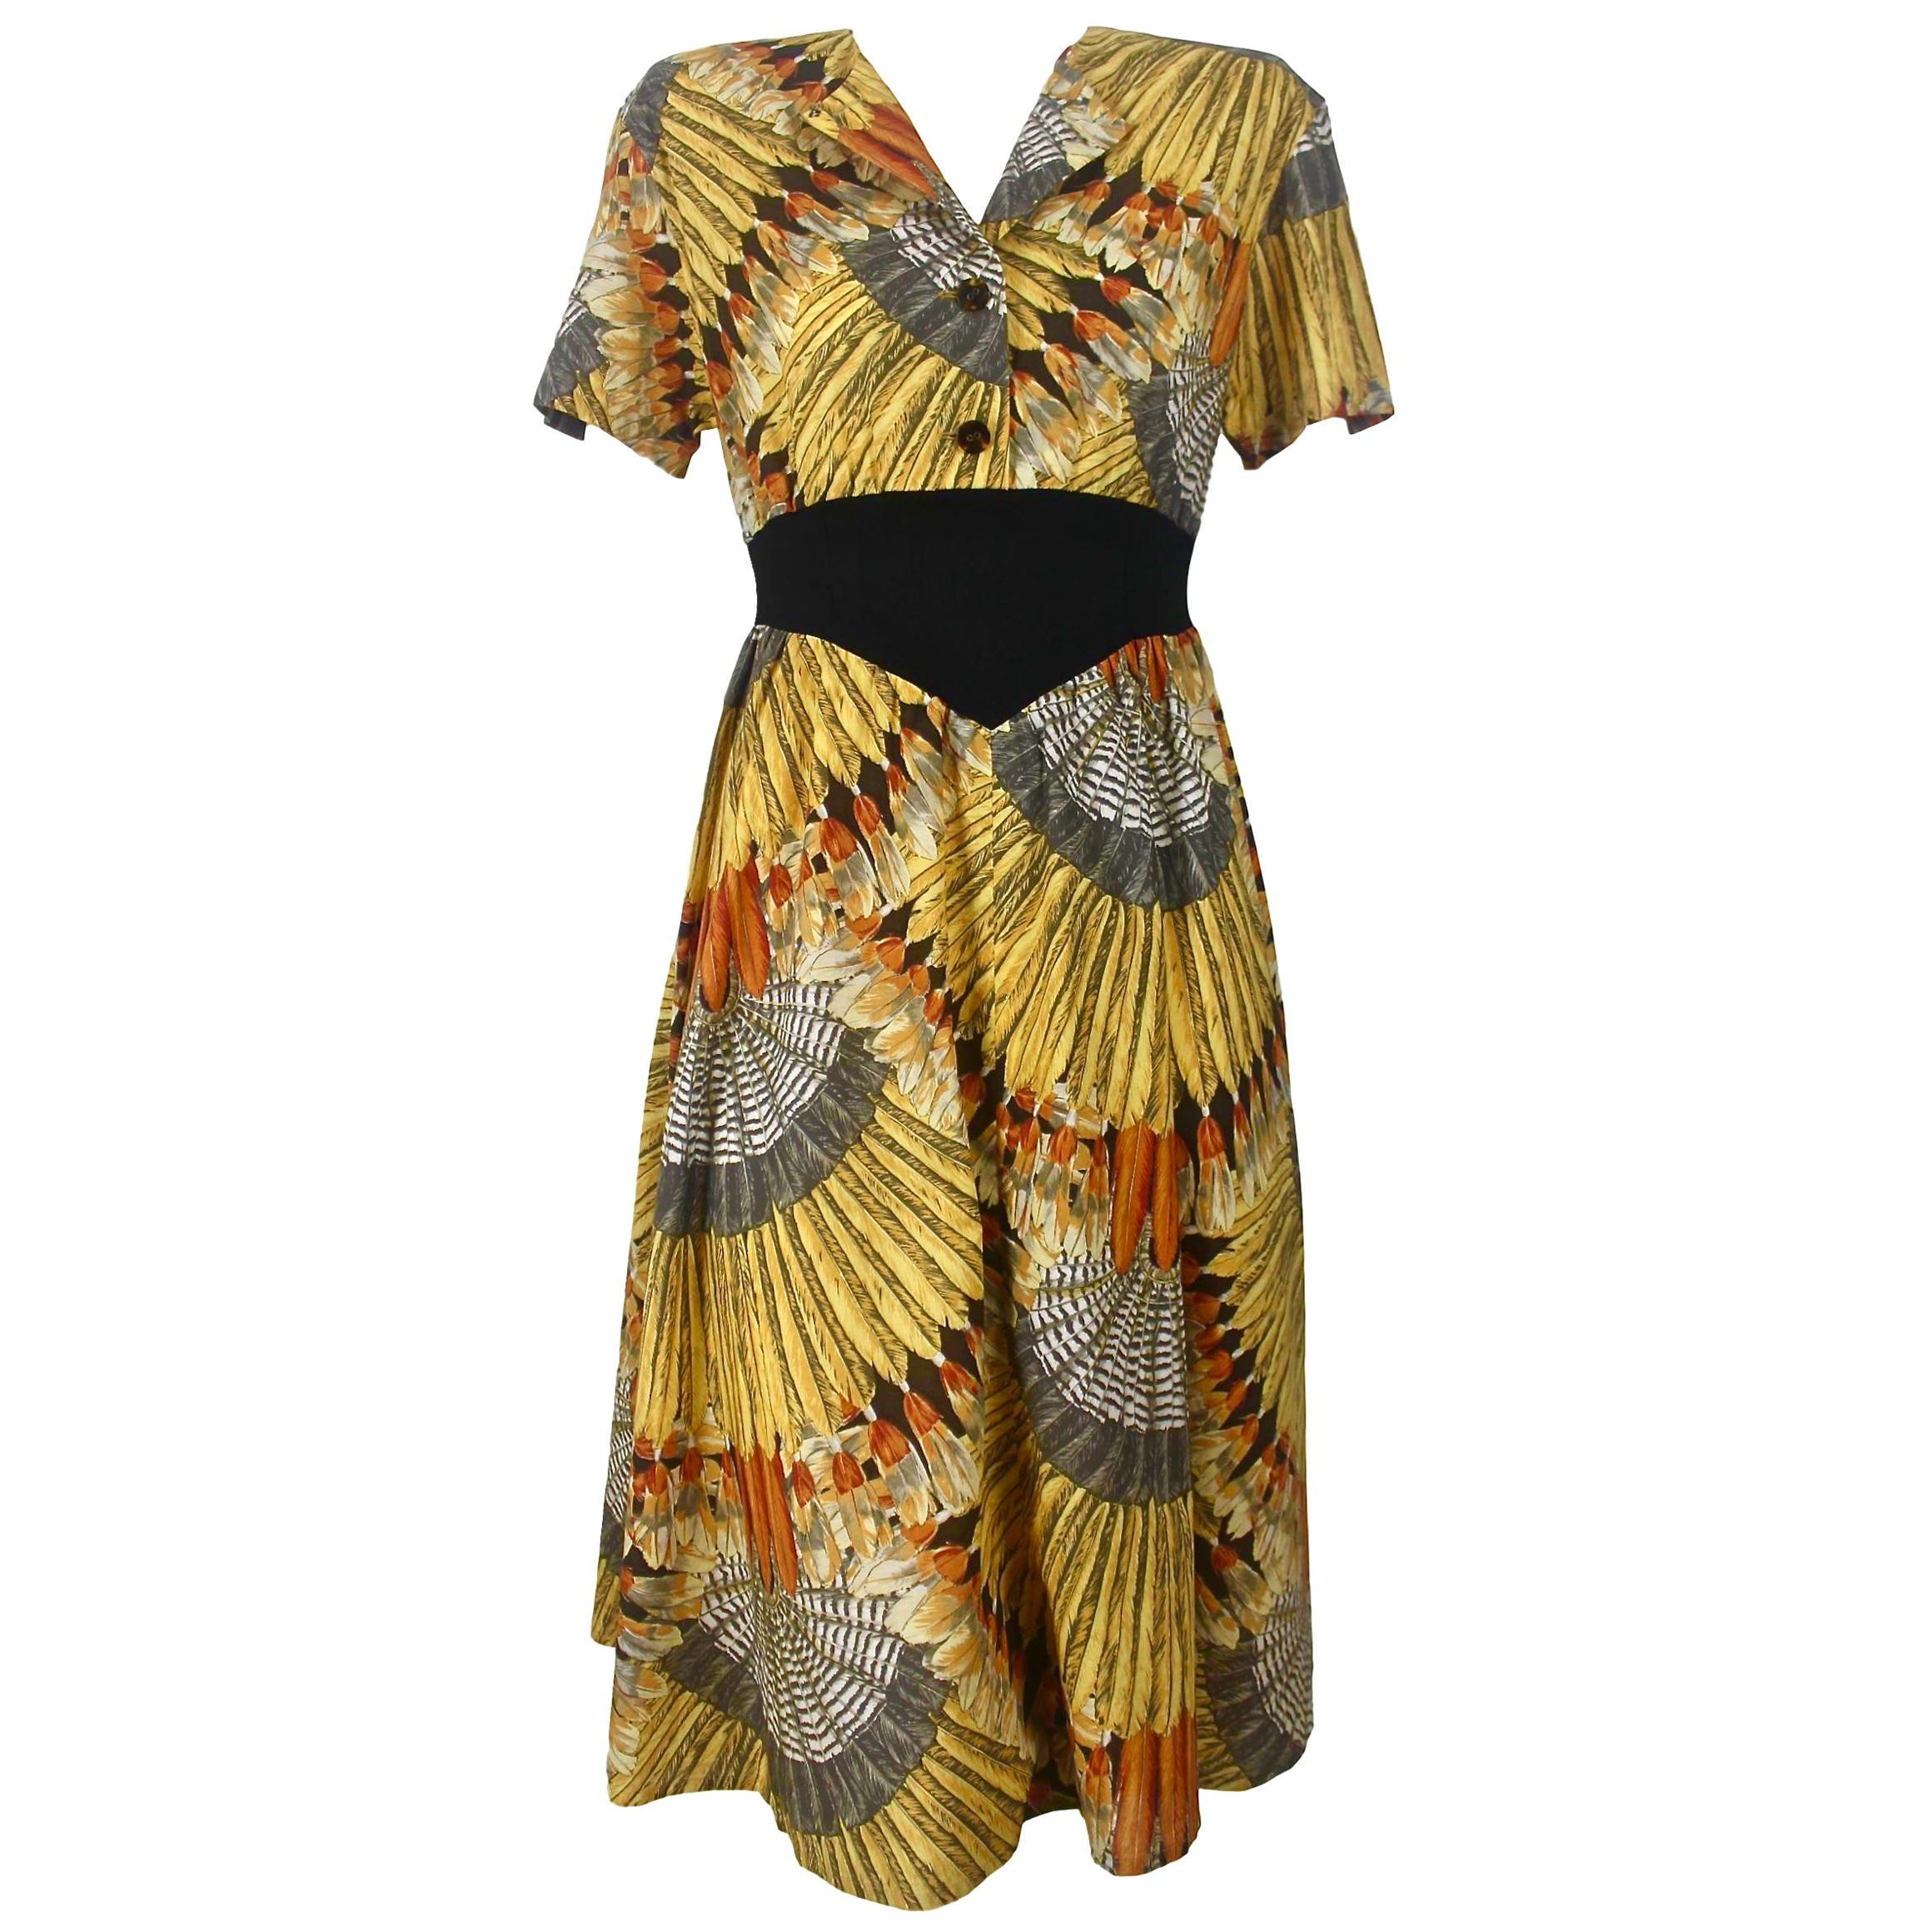 Sorelle Fontana Feather Print Dress